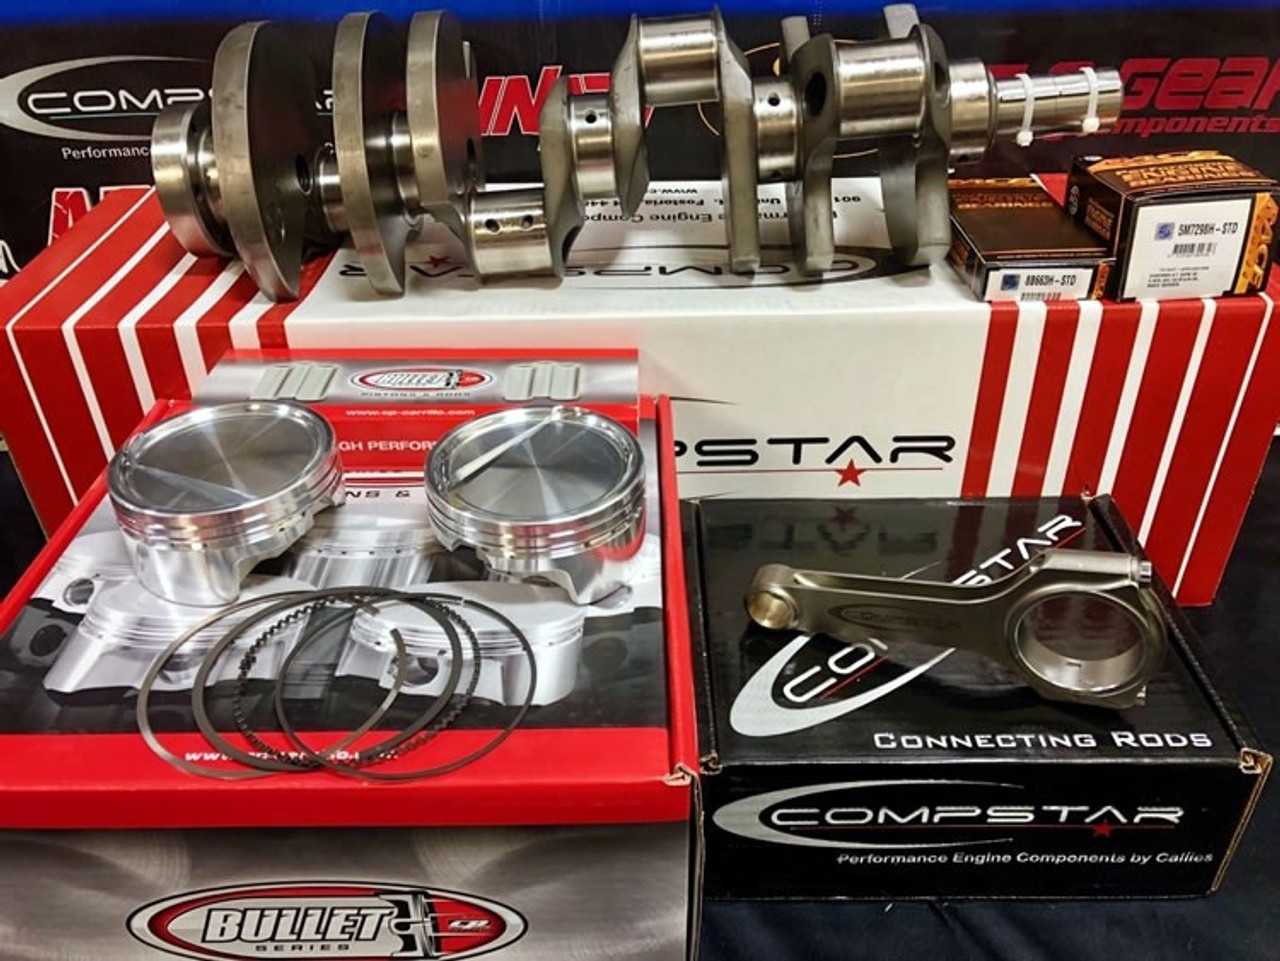 427ci 7.0L Stroker Kit   Callies 8ccw Crank / Compstar Rods   1,000 HP Rated